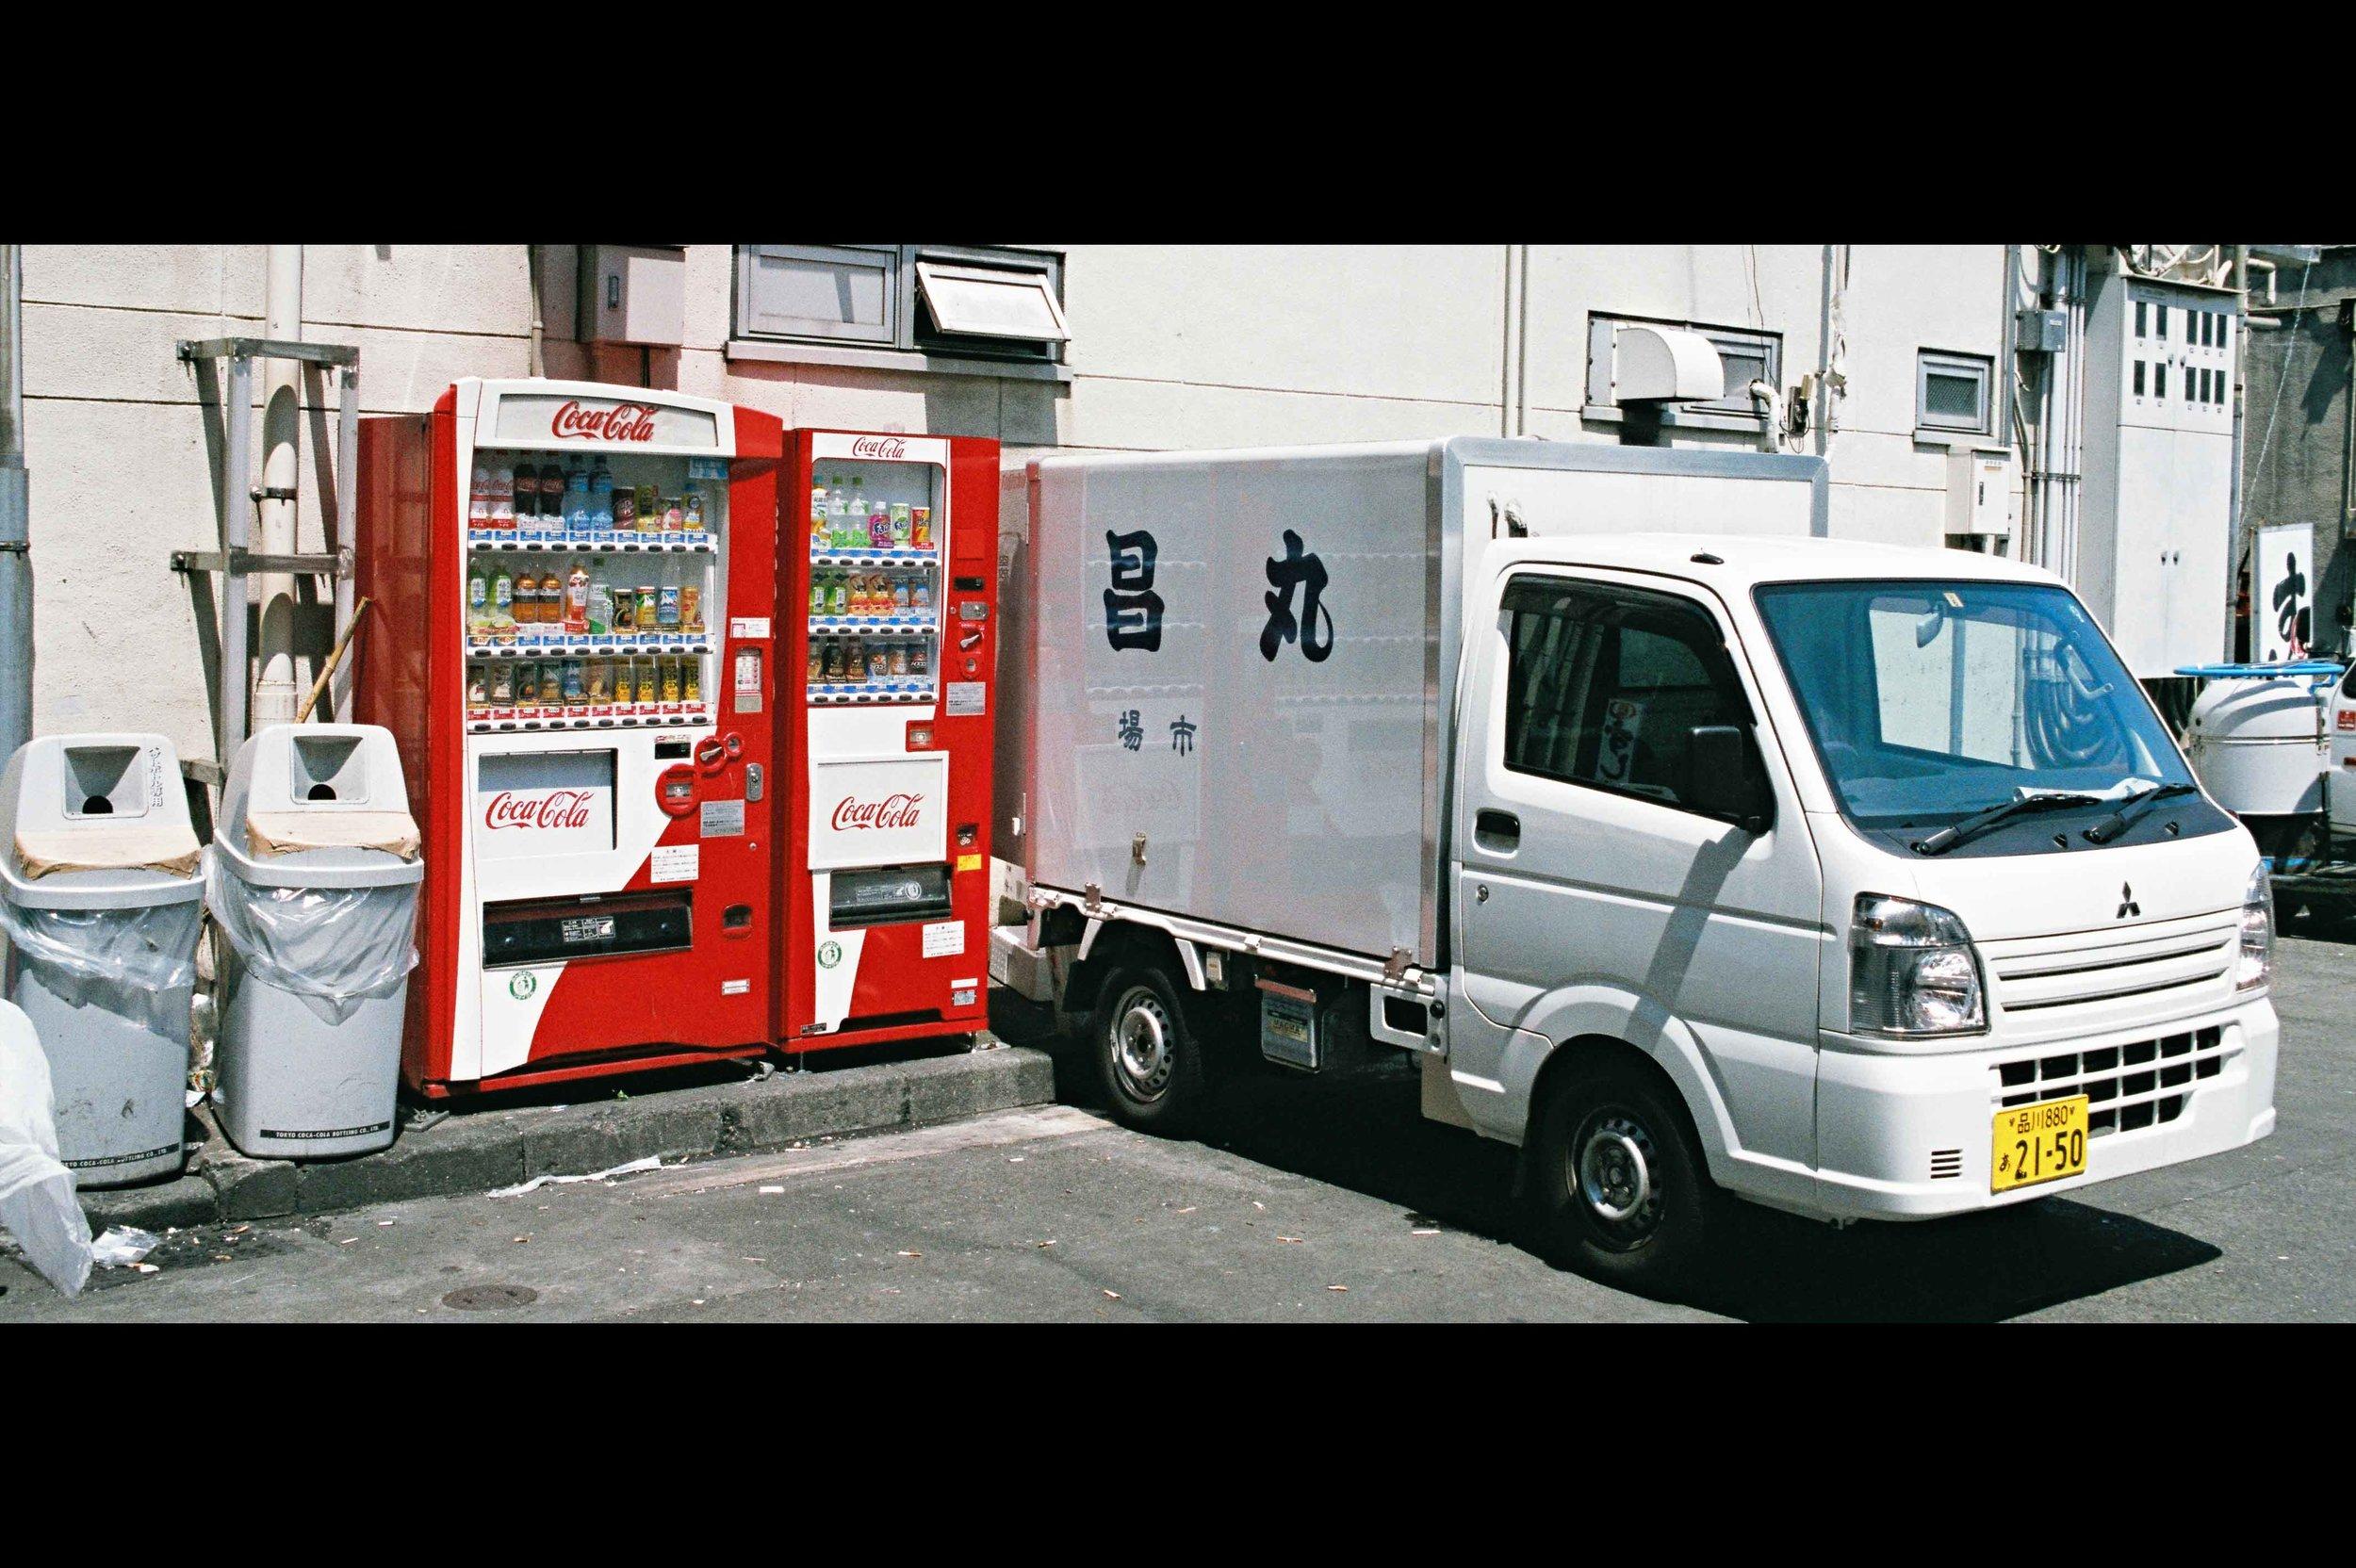 vending-machine-fish-van-market.jpg